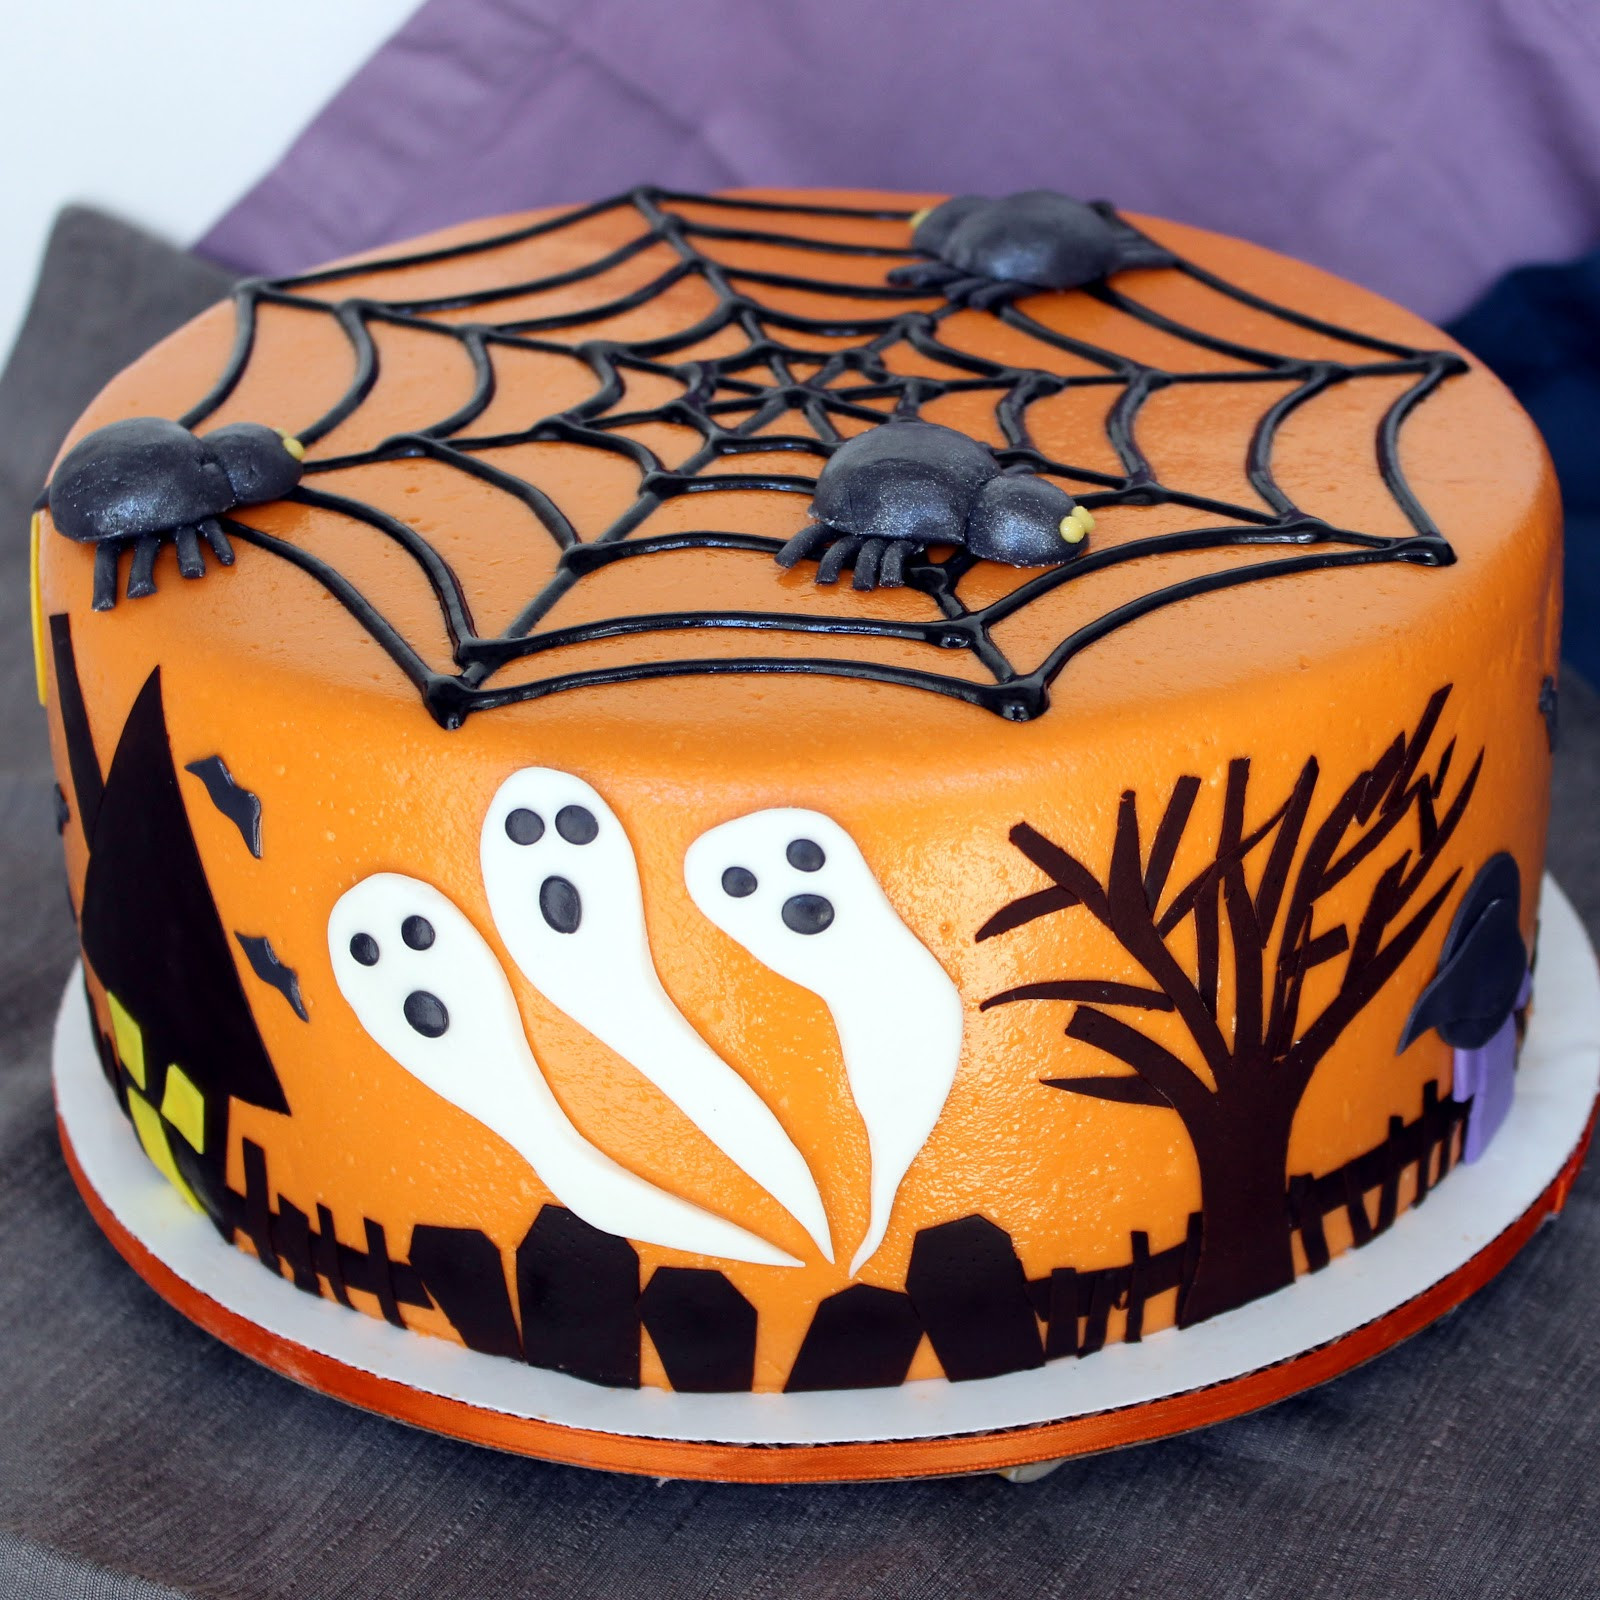 Halloween Decorating Cakes  Halloween Cake Ideas The Xerxes